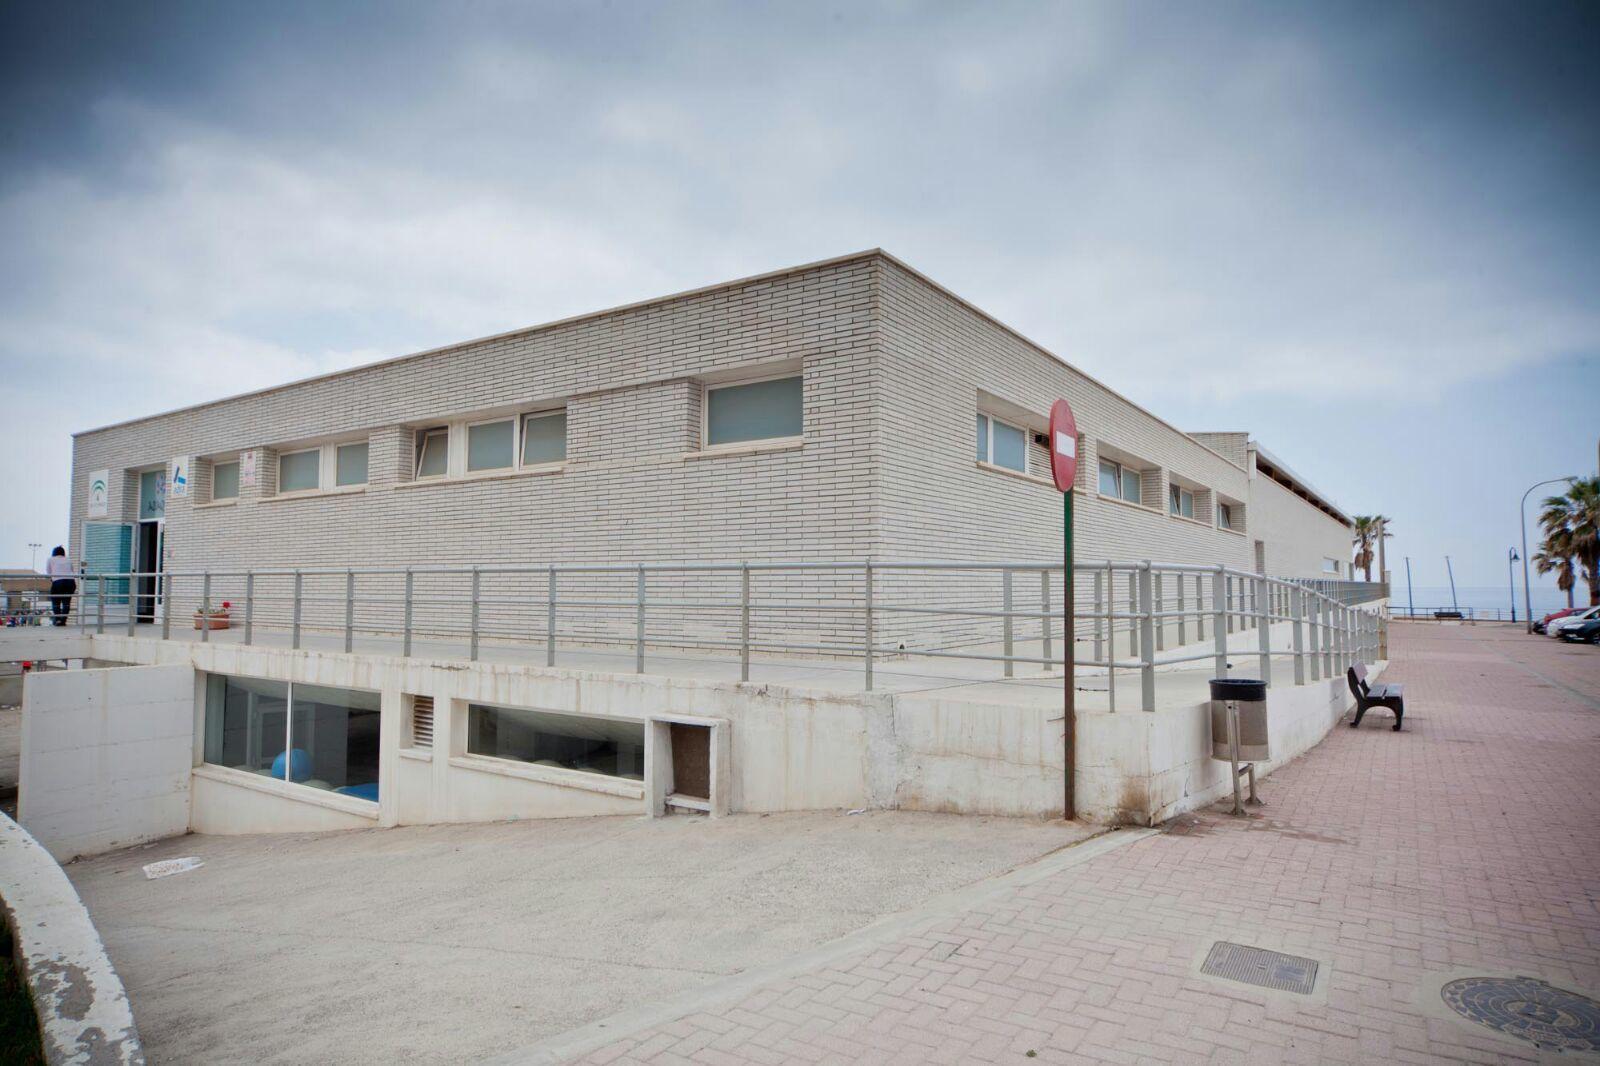 Euros para dar viabilidad al servicio de piscina for Piscina municipal almeria